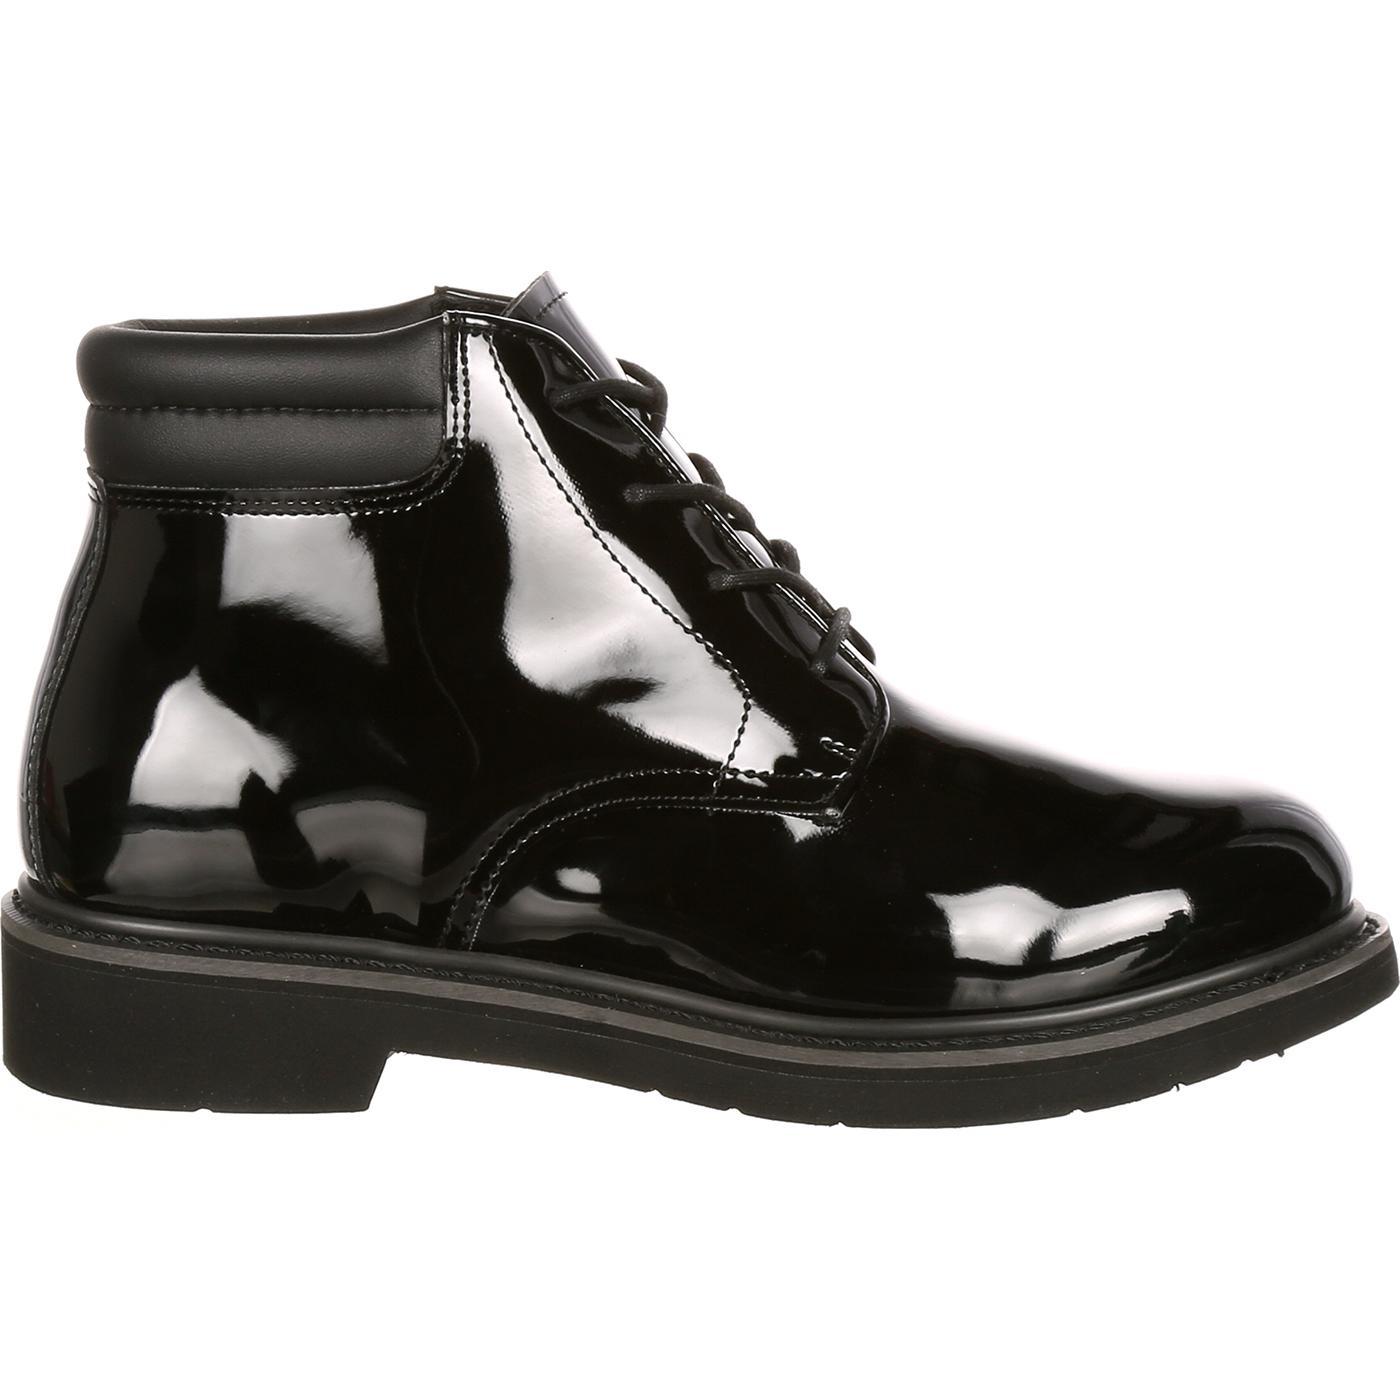 5624d36332f Rocky Dress Leather High Gloss Chukka